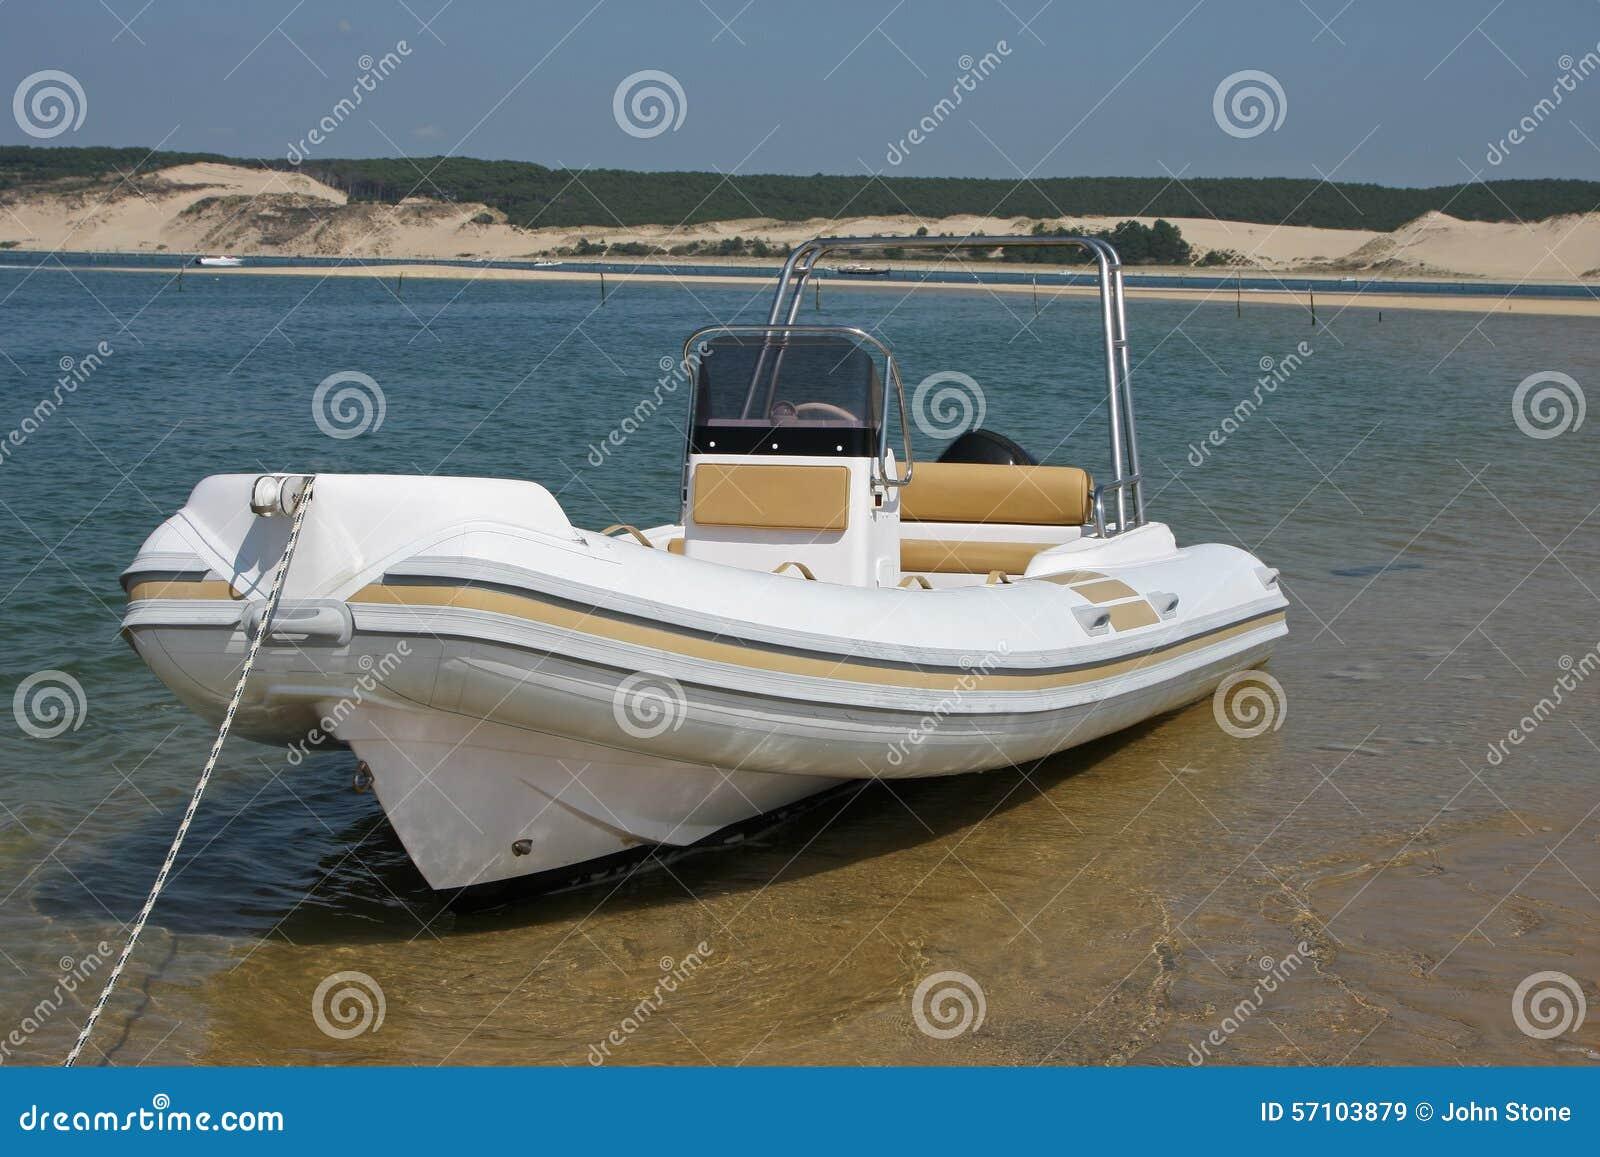 Motor Boat Stock Image Image Of Watercraft Speed Rigid